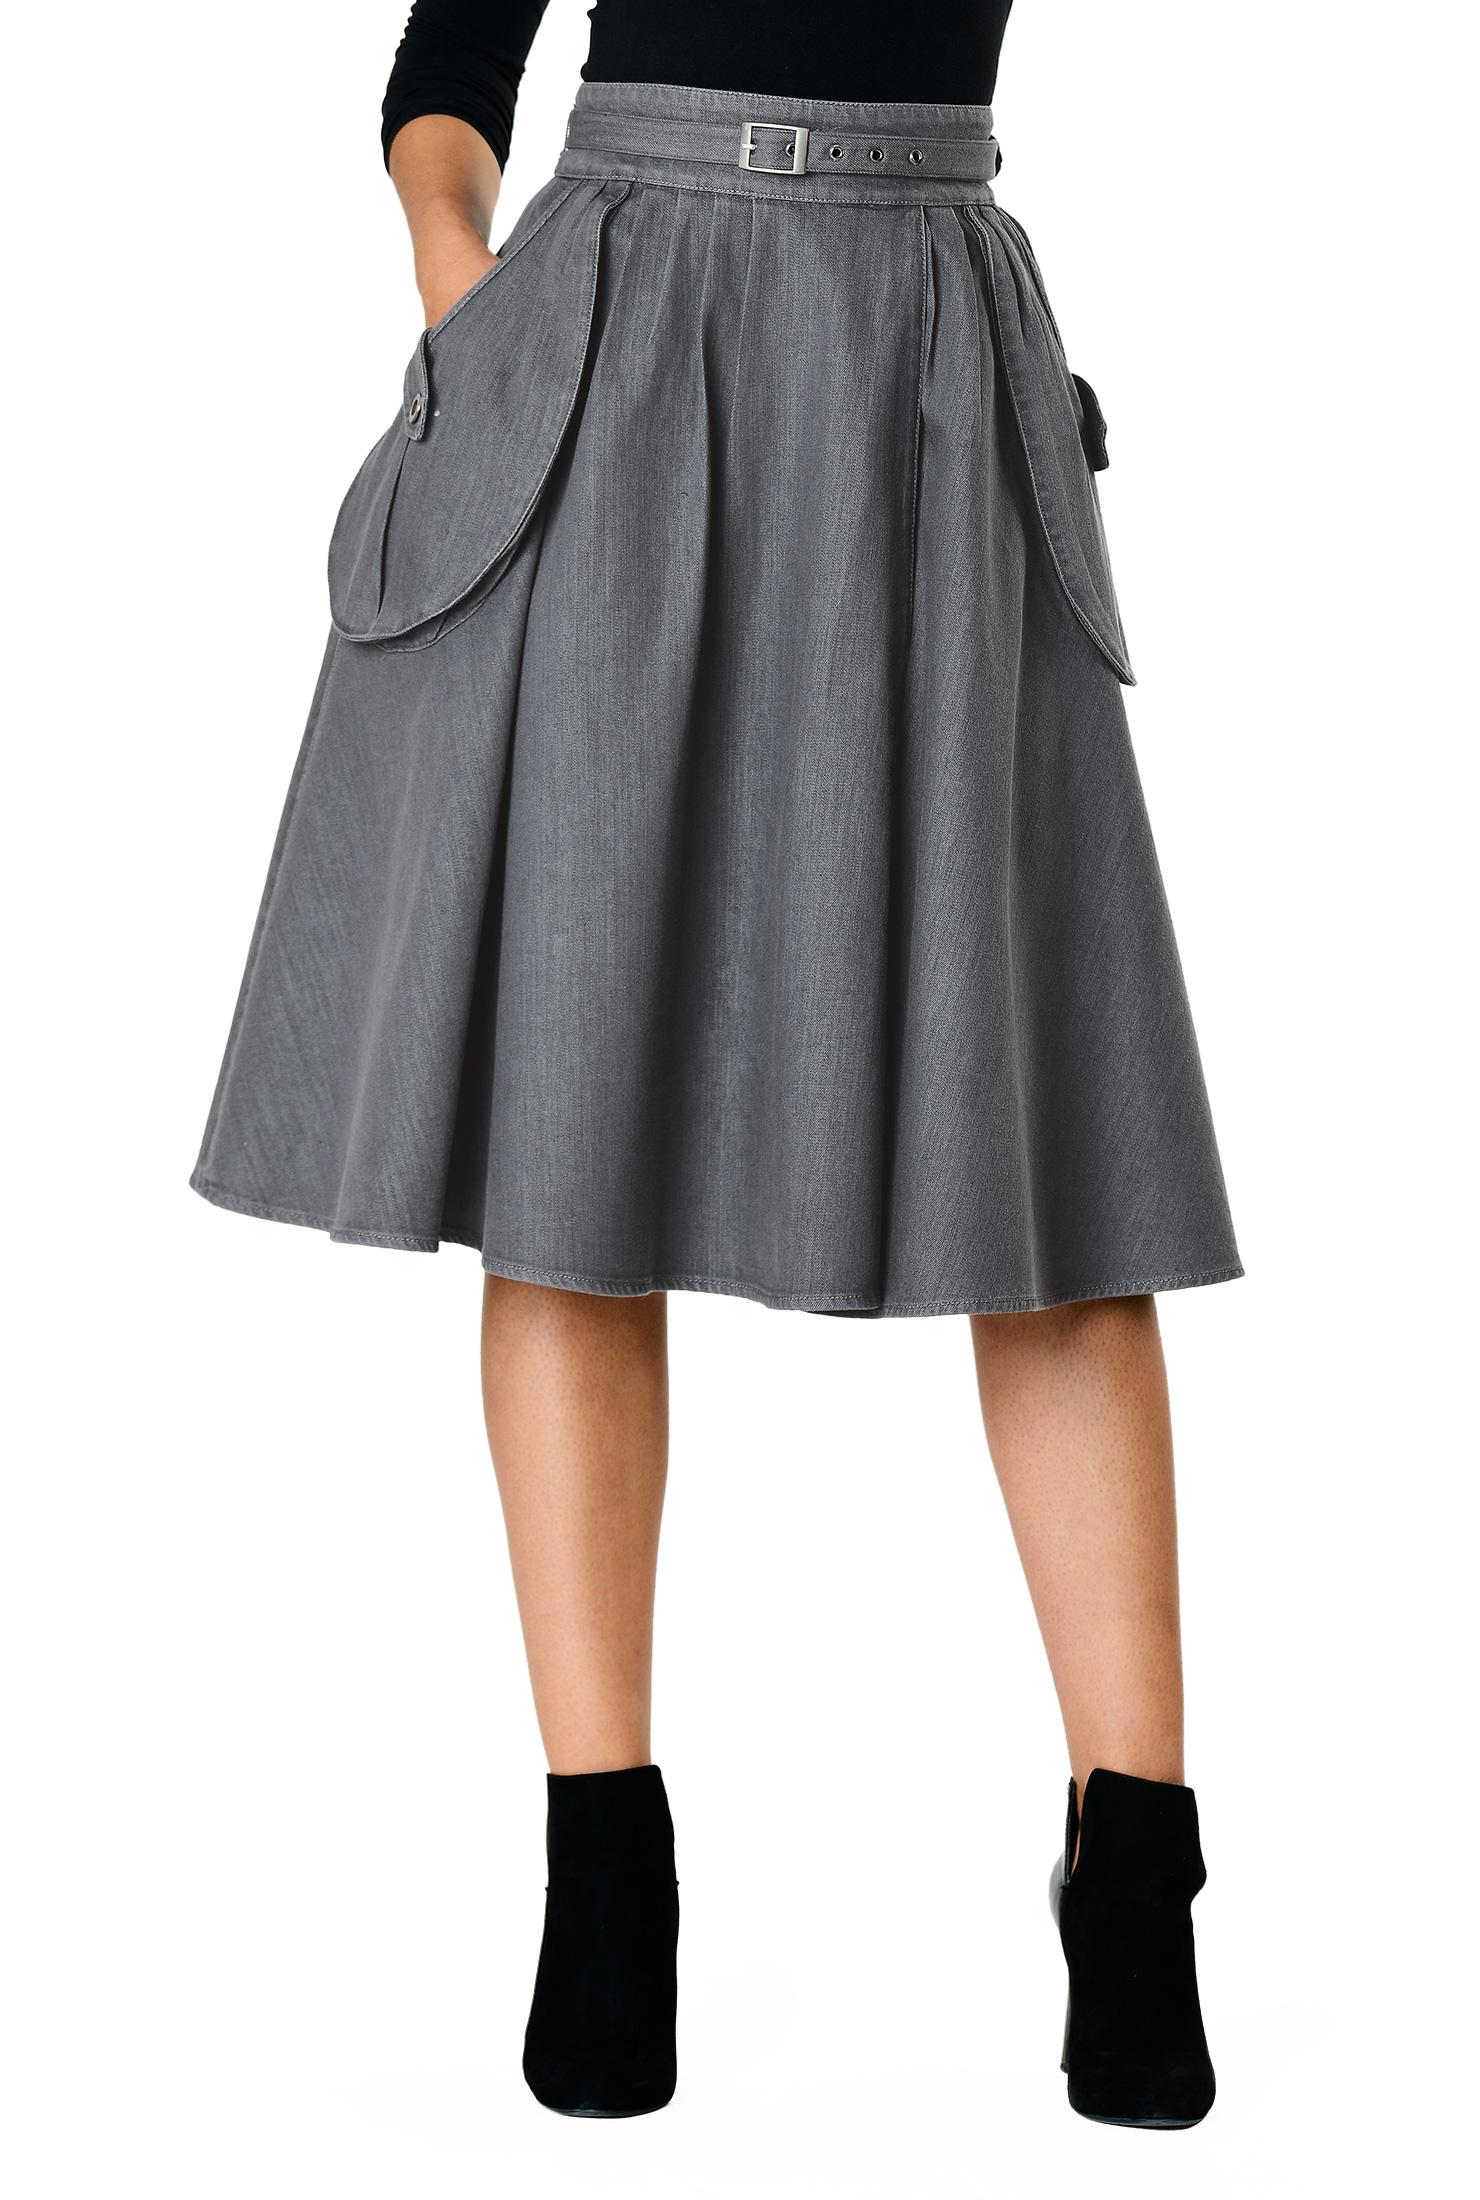 4debdf9f9c1c banded waist skirts, below knee length skirts, cotton skirts, Cotton /polyamide